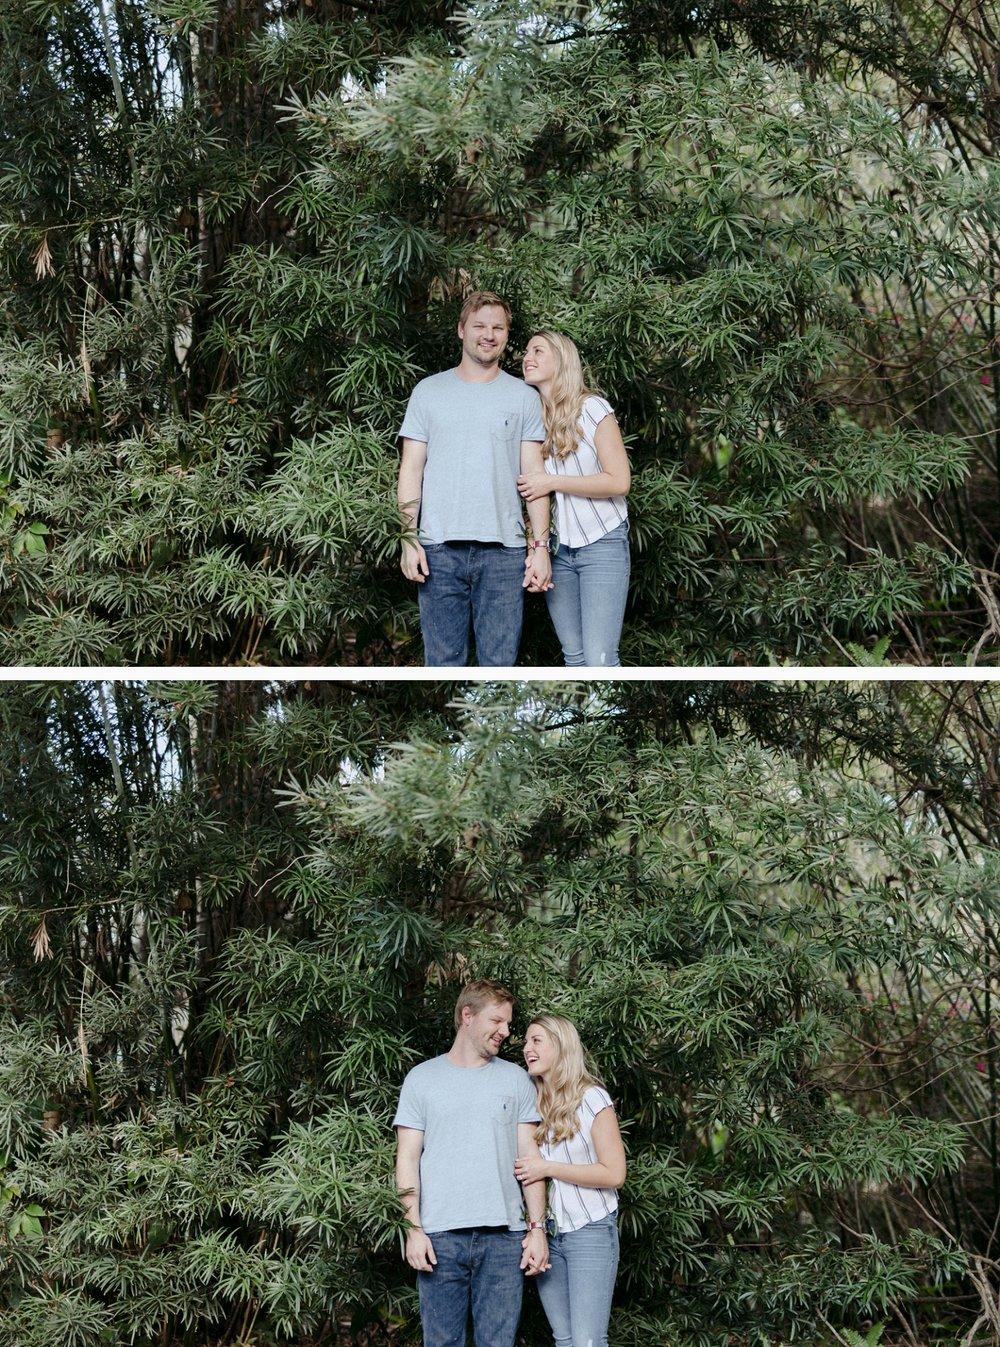 Kylie-And-Jack-Mead-Botanical-Garden-Engagement_0010.jpg